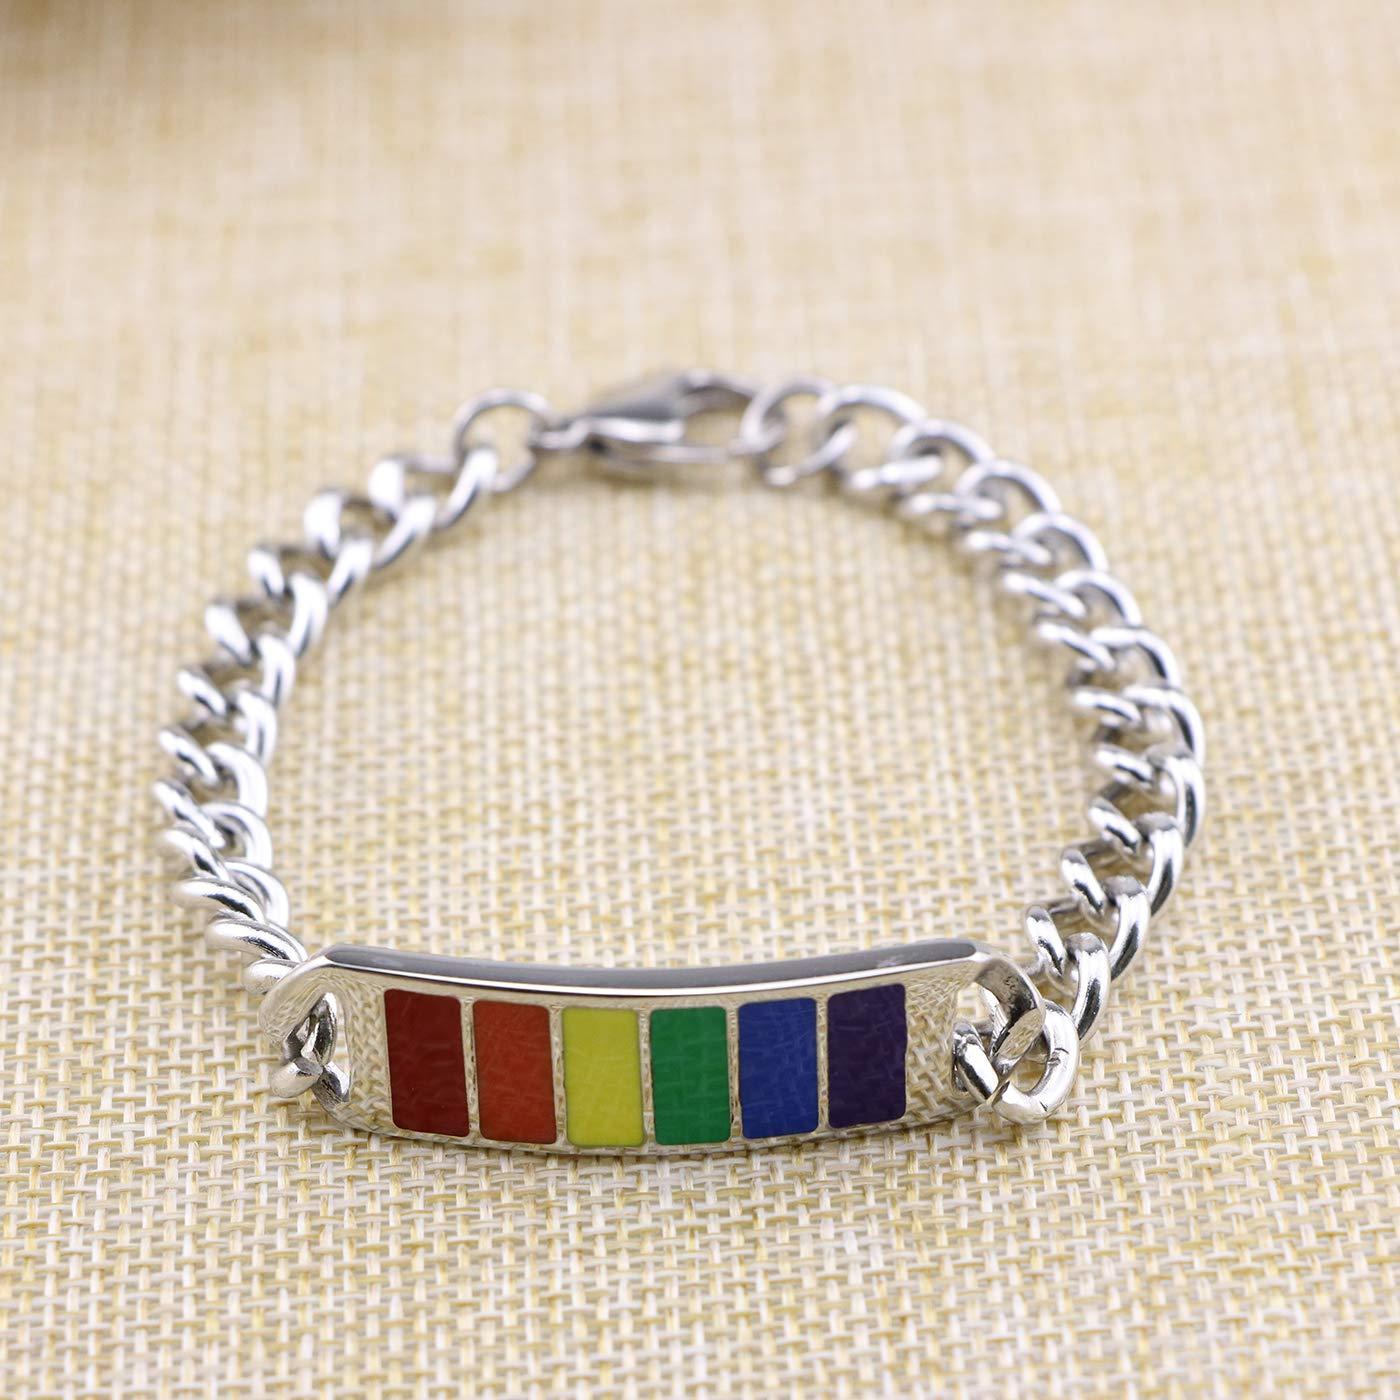 Awegift Stainless Steel Rainbow Gay Lesbian LGBT Chain Bracelet 10mm 13mm Width